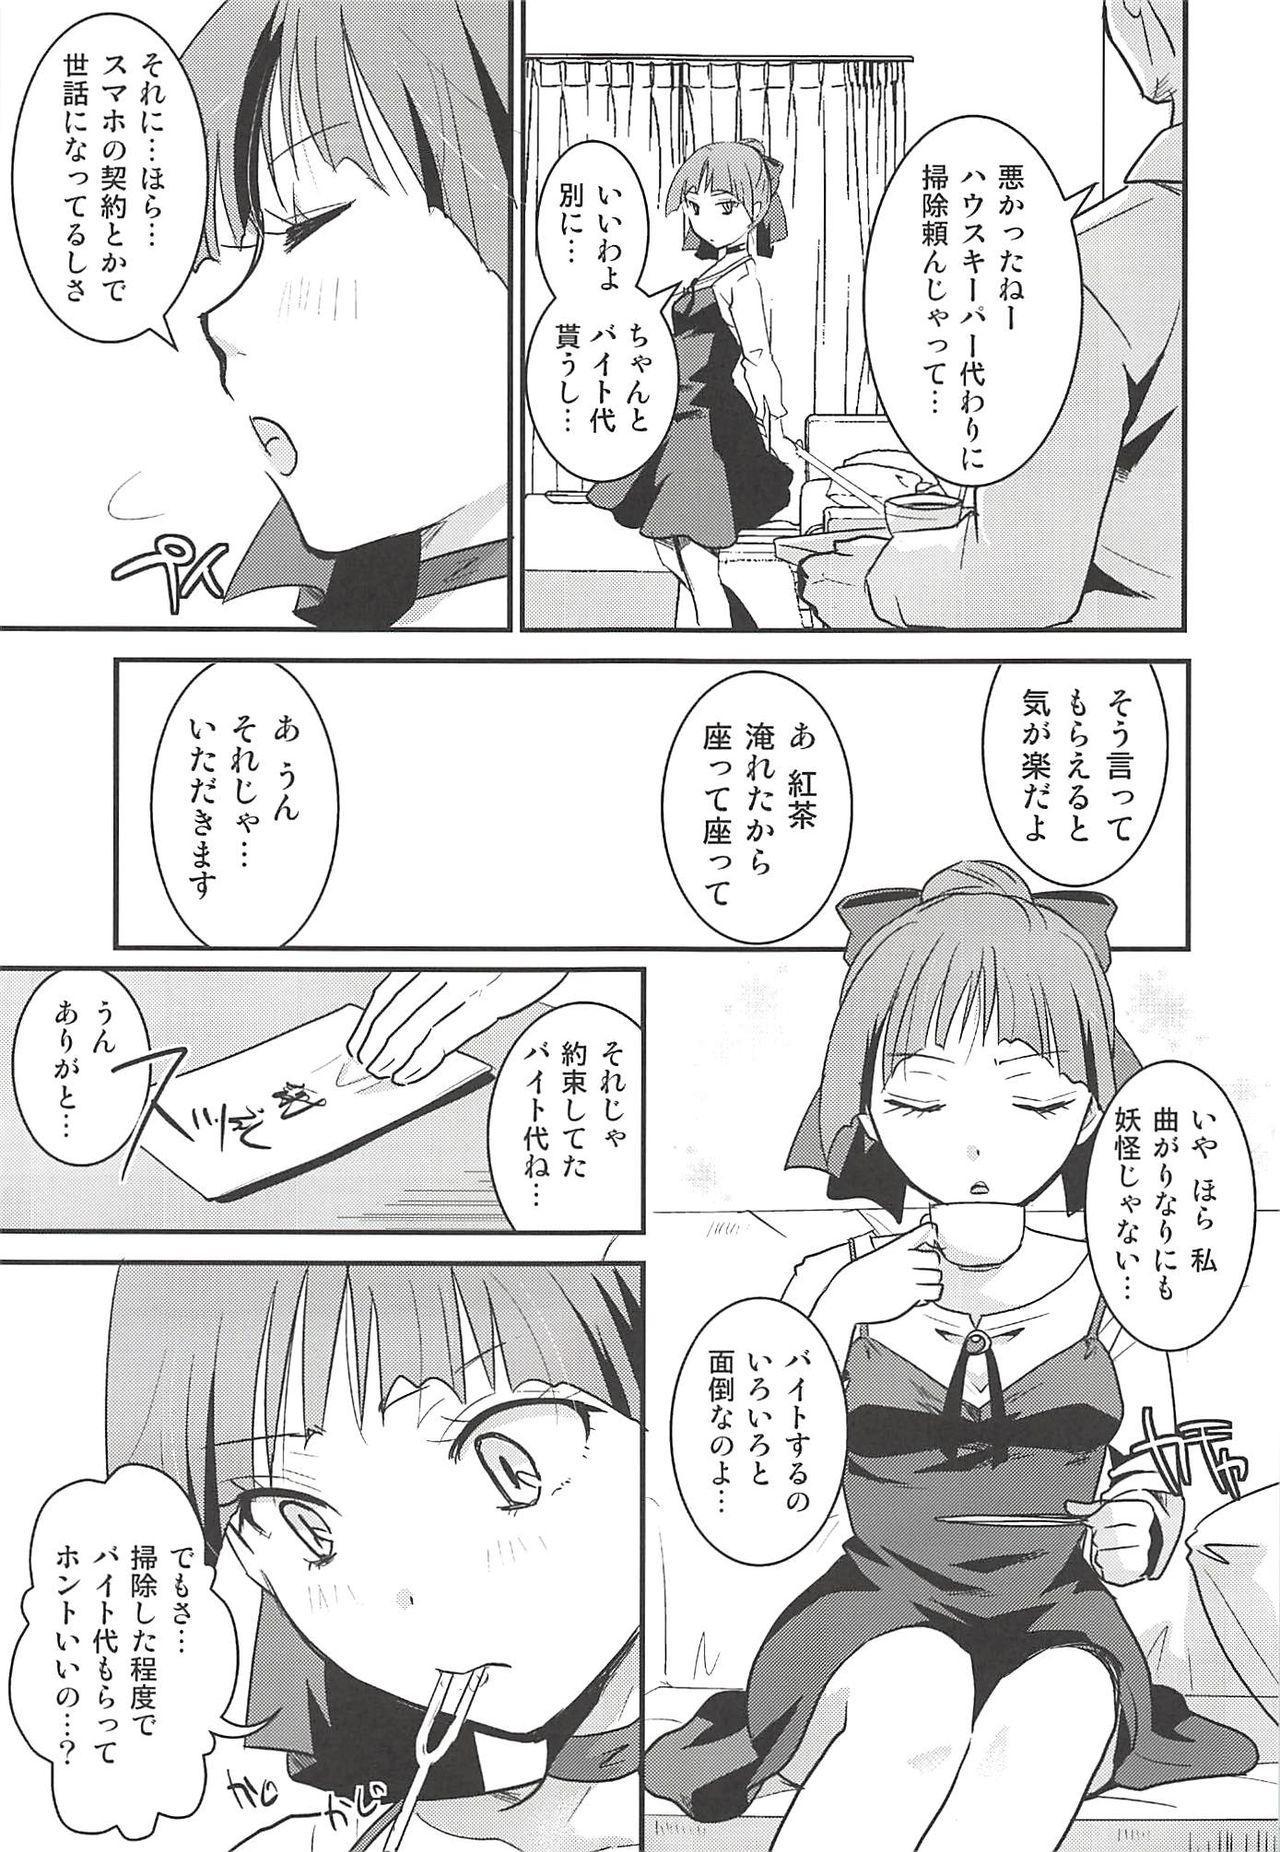 Neko Musume Suikan 5